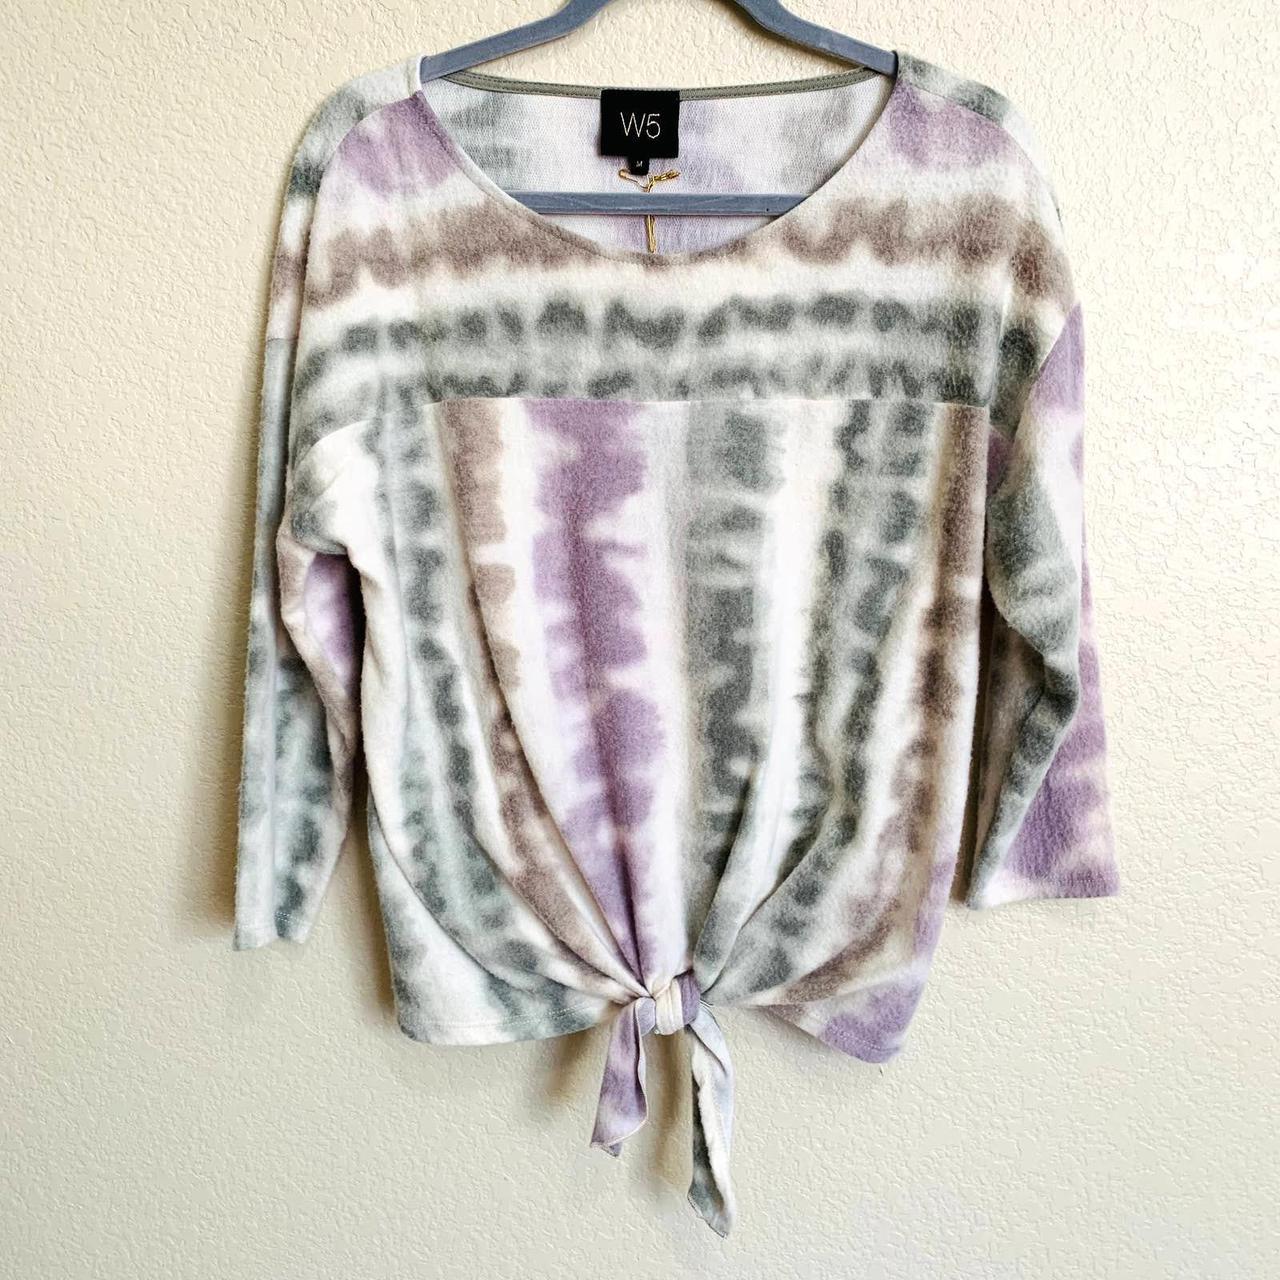 Product Image 1 - New Anthropology W5 women clothing